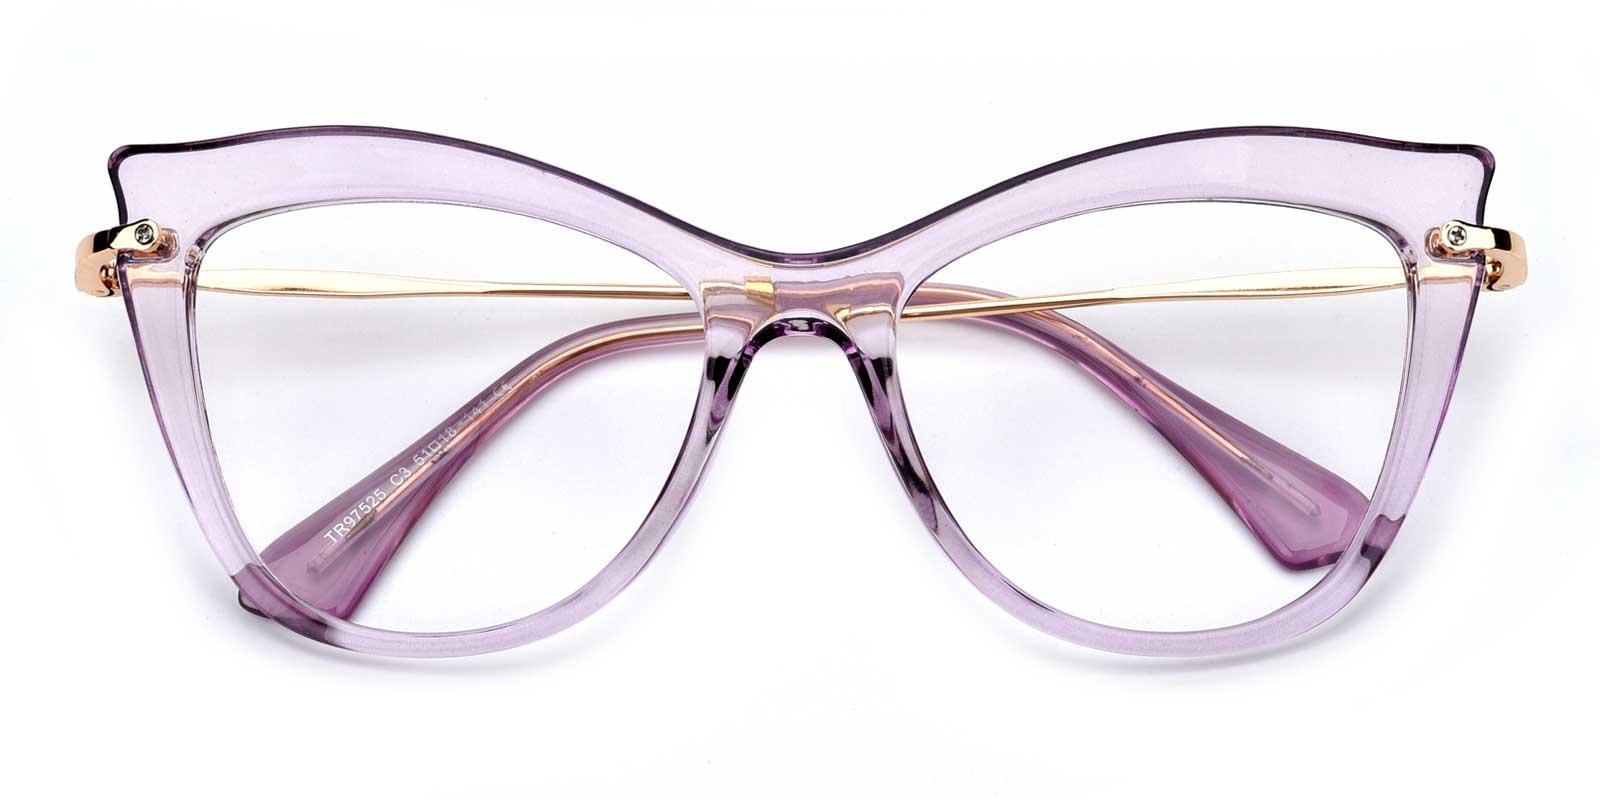 Agatha-Purple-Cat-Combination-Eyeglasses-detail